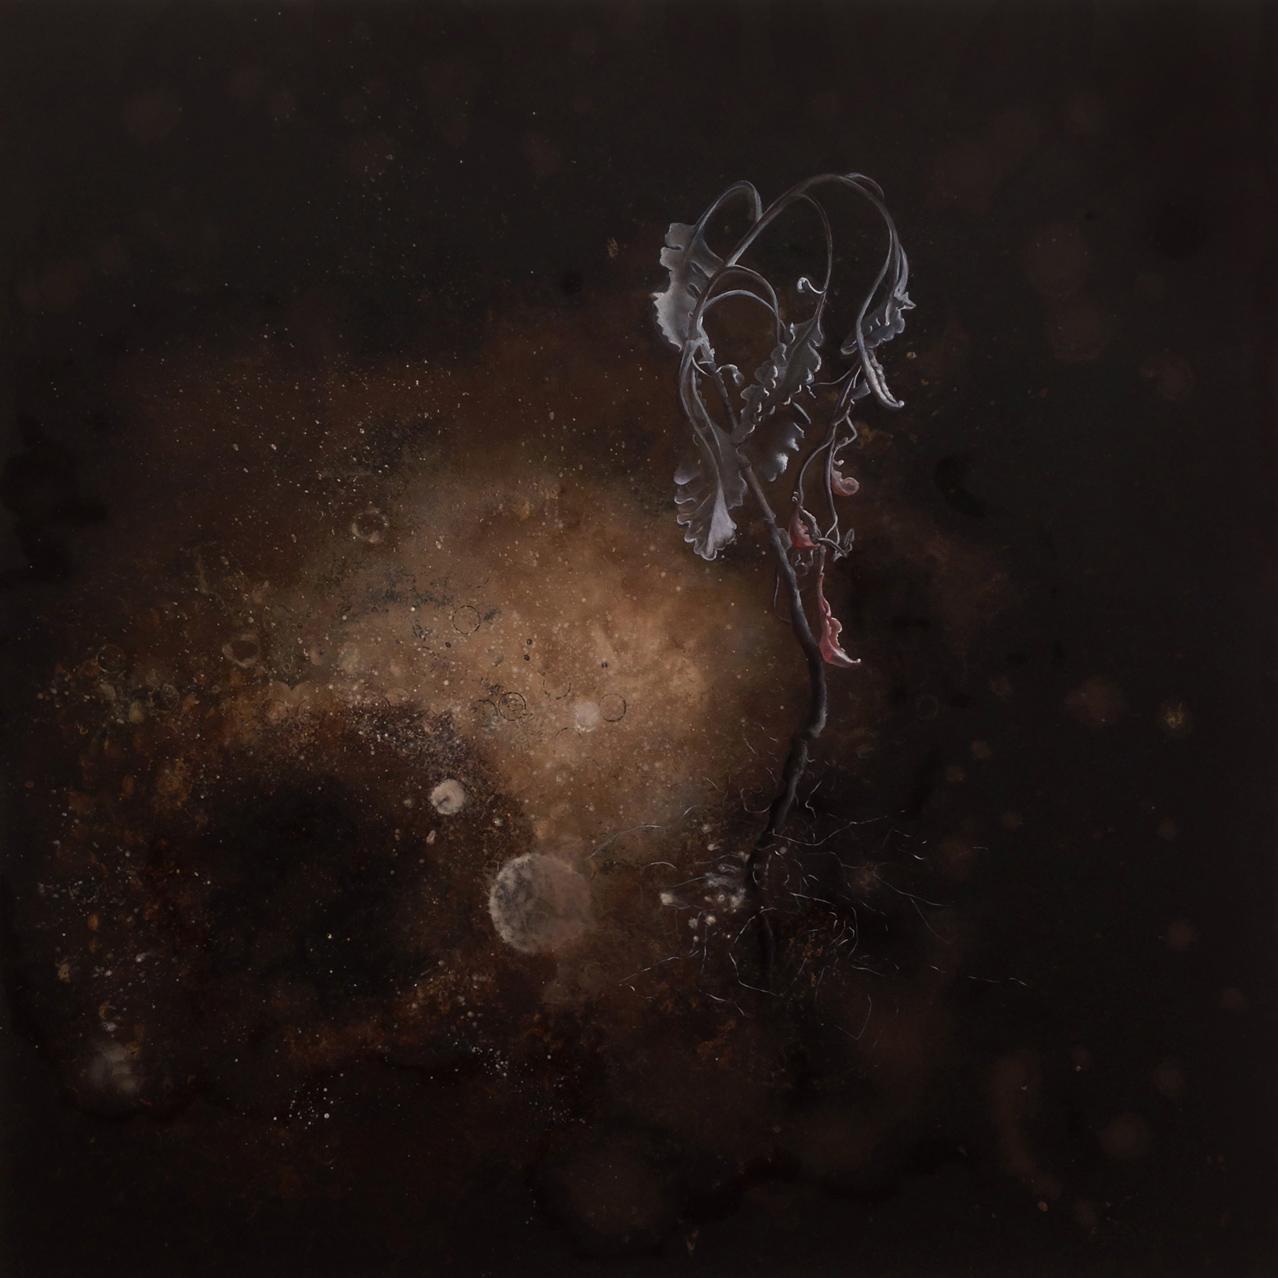 Cirrus , 2014, oil on board, 60 x 60 cm